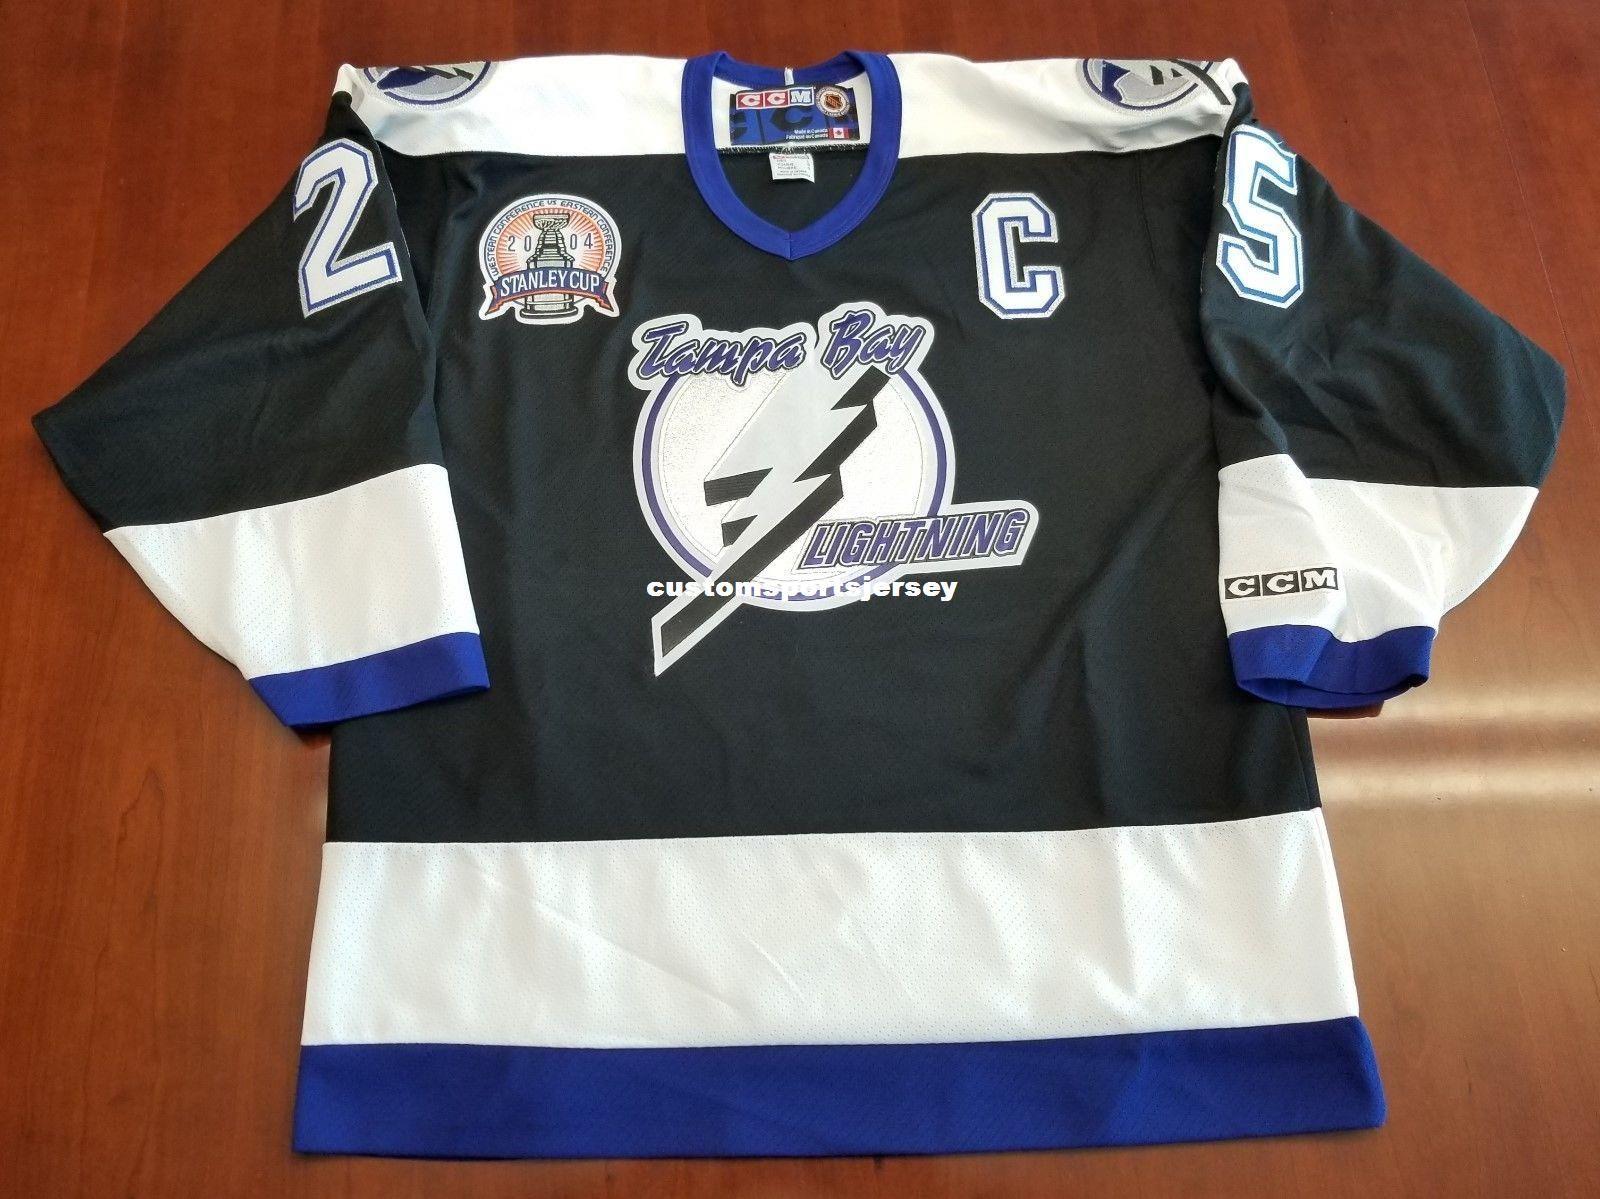 2019 Cheap Custom Dave Andreychuk Vintage Tampa Bay Lightning CCM Jersey  2004 Cup Patch Stitched Retro Hockey Jersey XS 5XL From Customsportsjersey f2e55551a